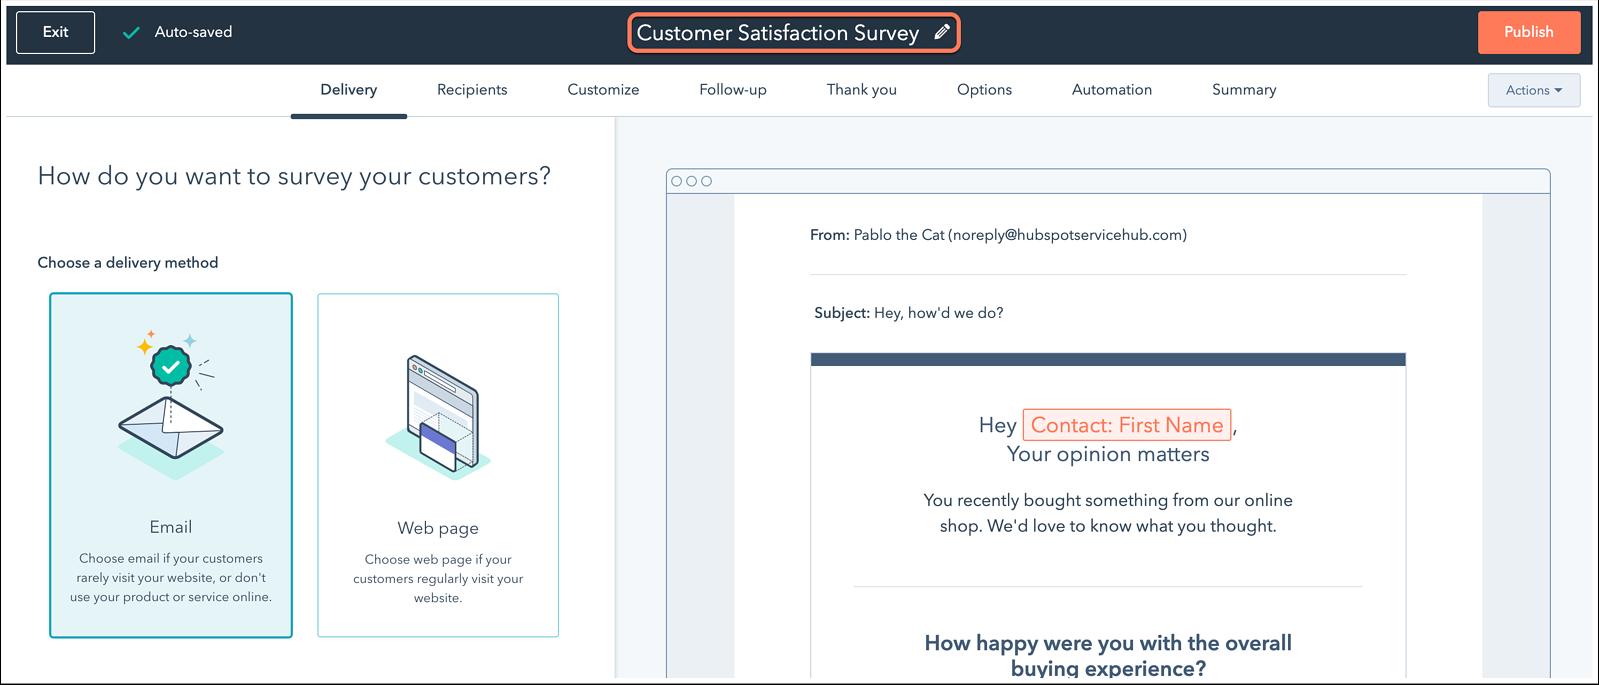 HubSpot's customer satisfaction survey tool